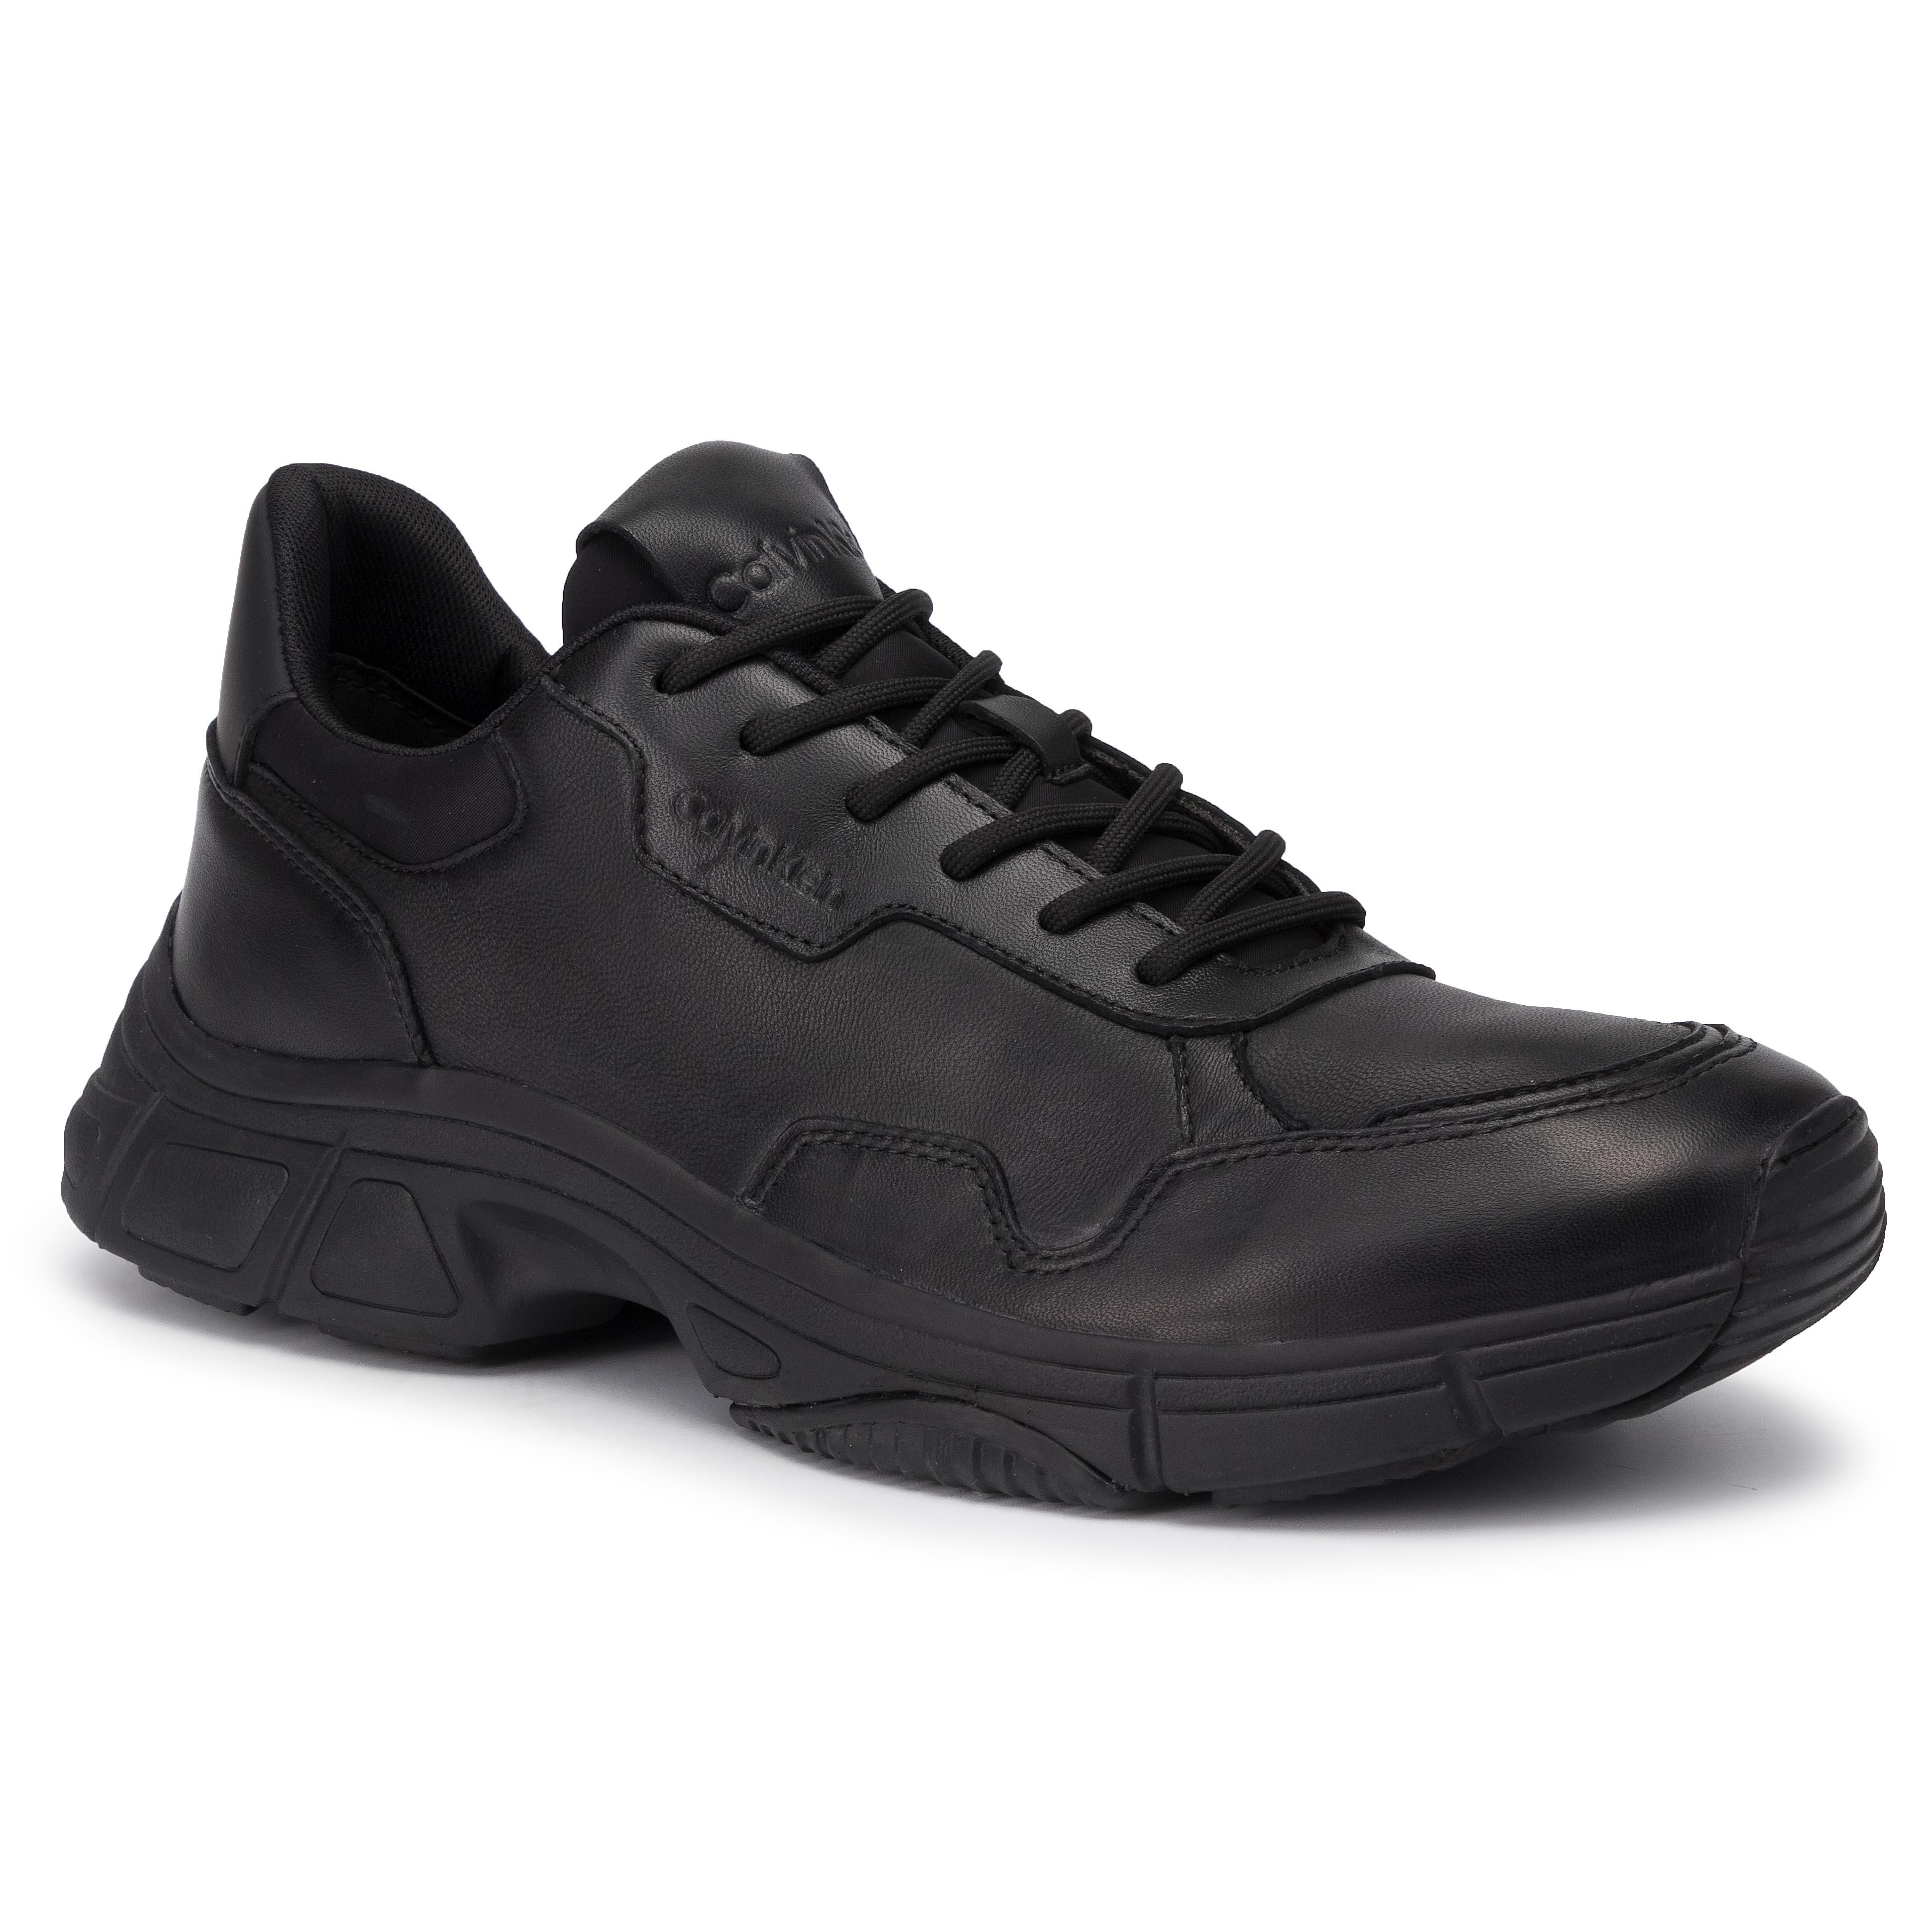 Sneakers CALVIN KLEIN - Demos B4F2104  Black